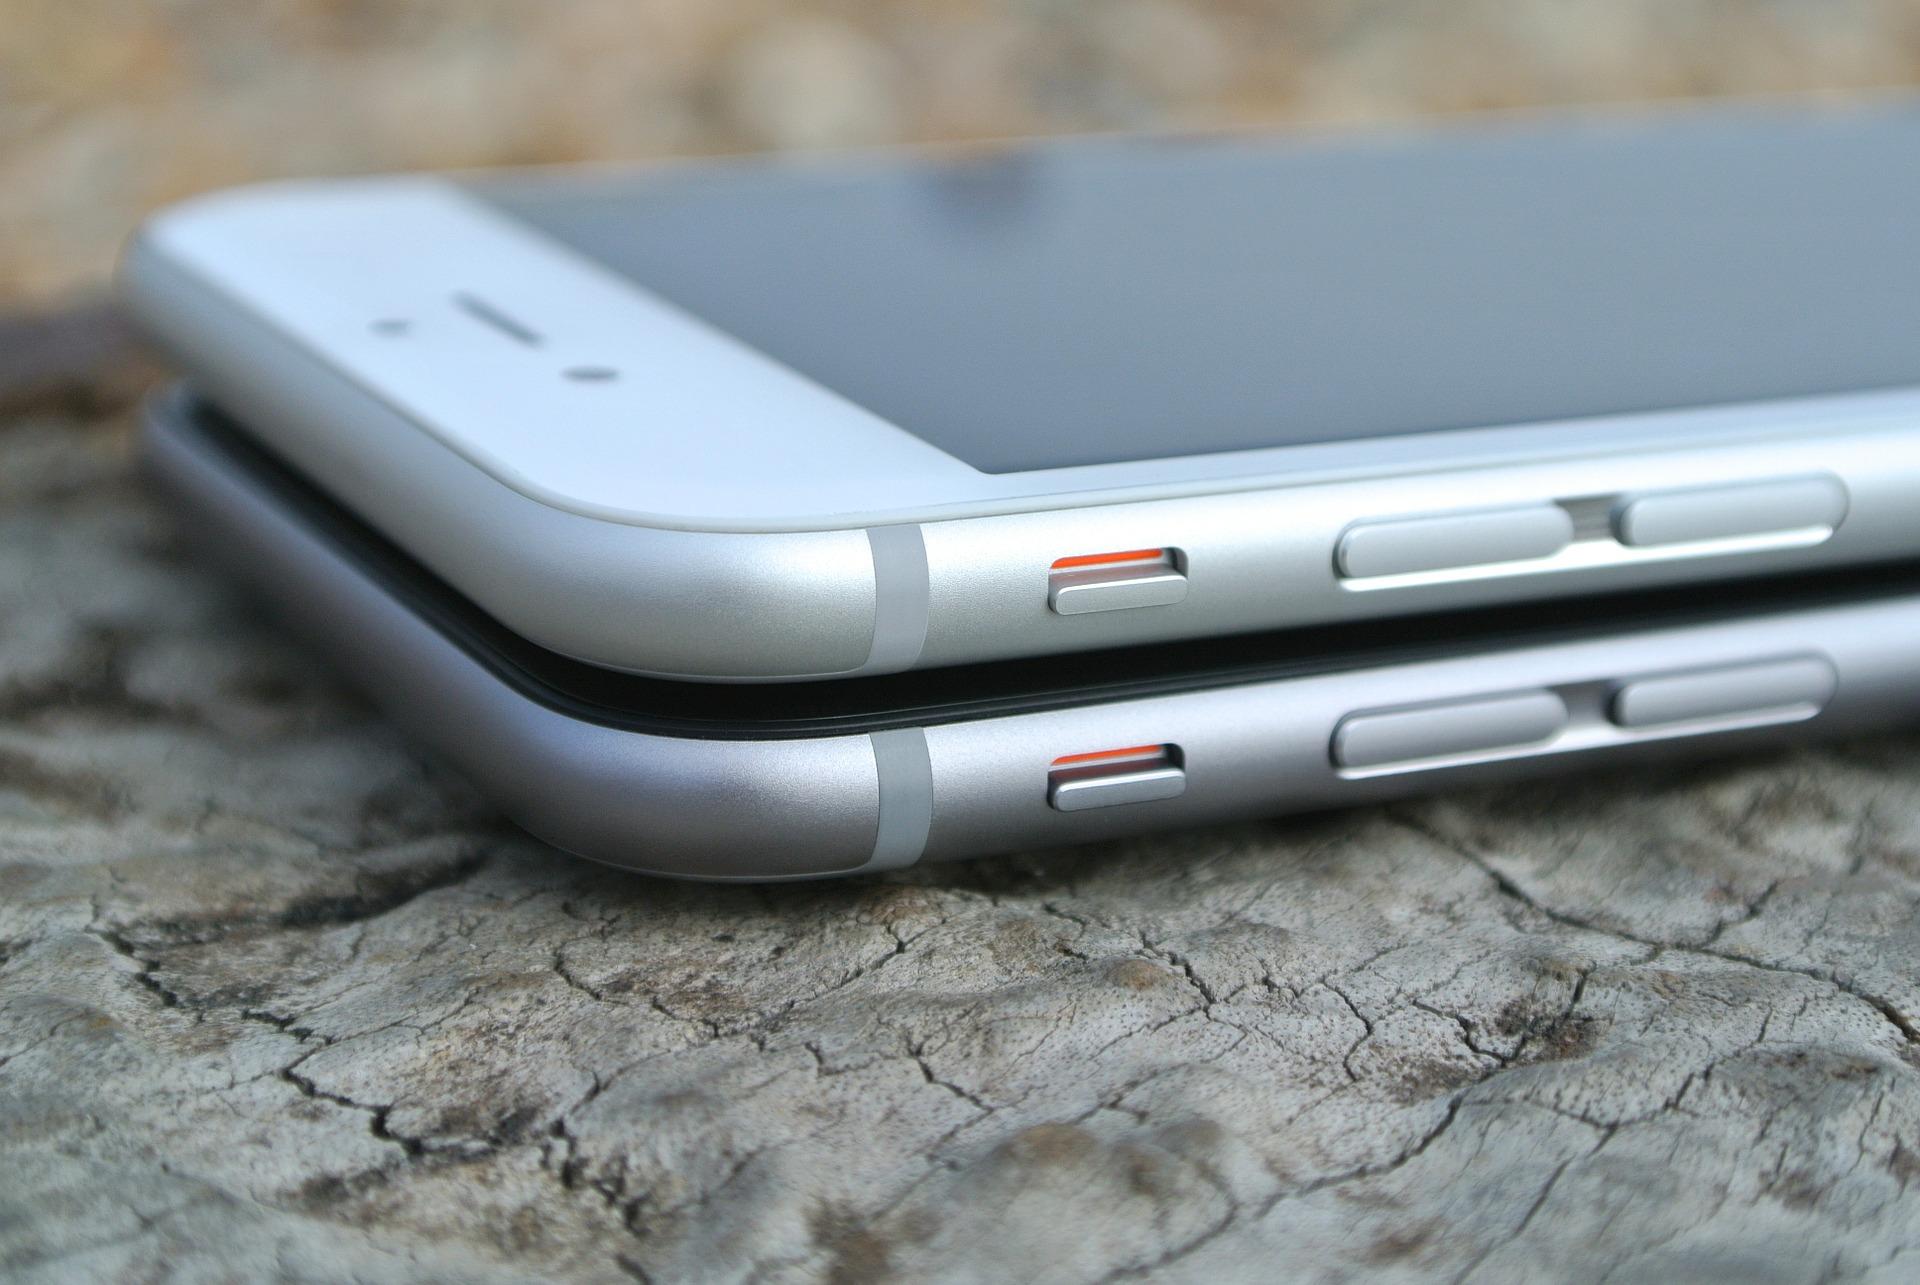 iphone-6-458151_1920